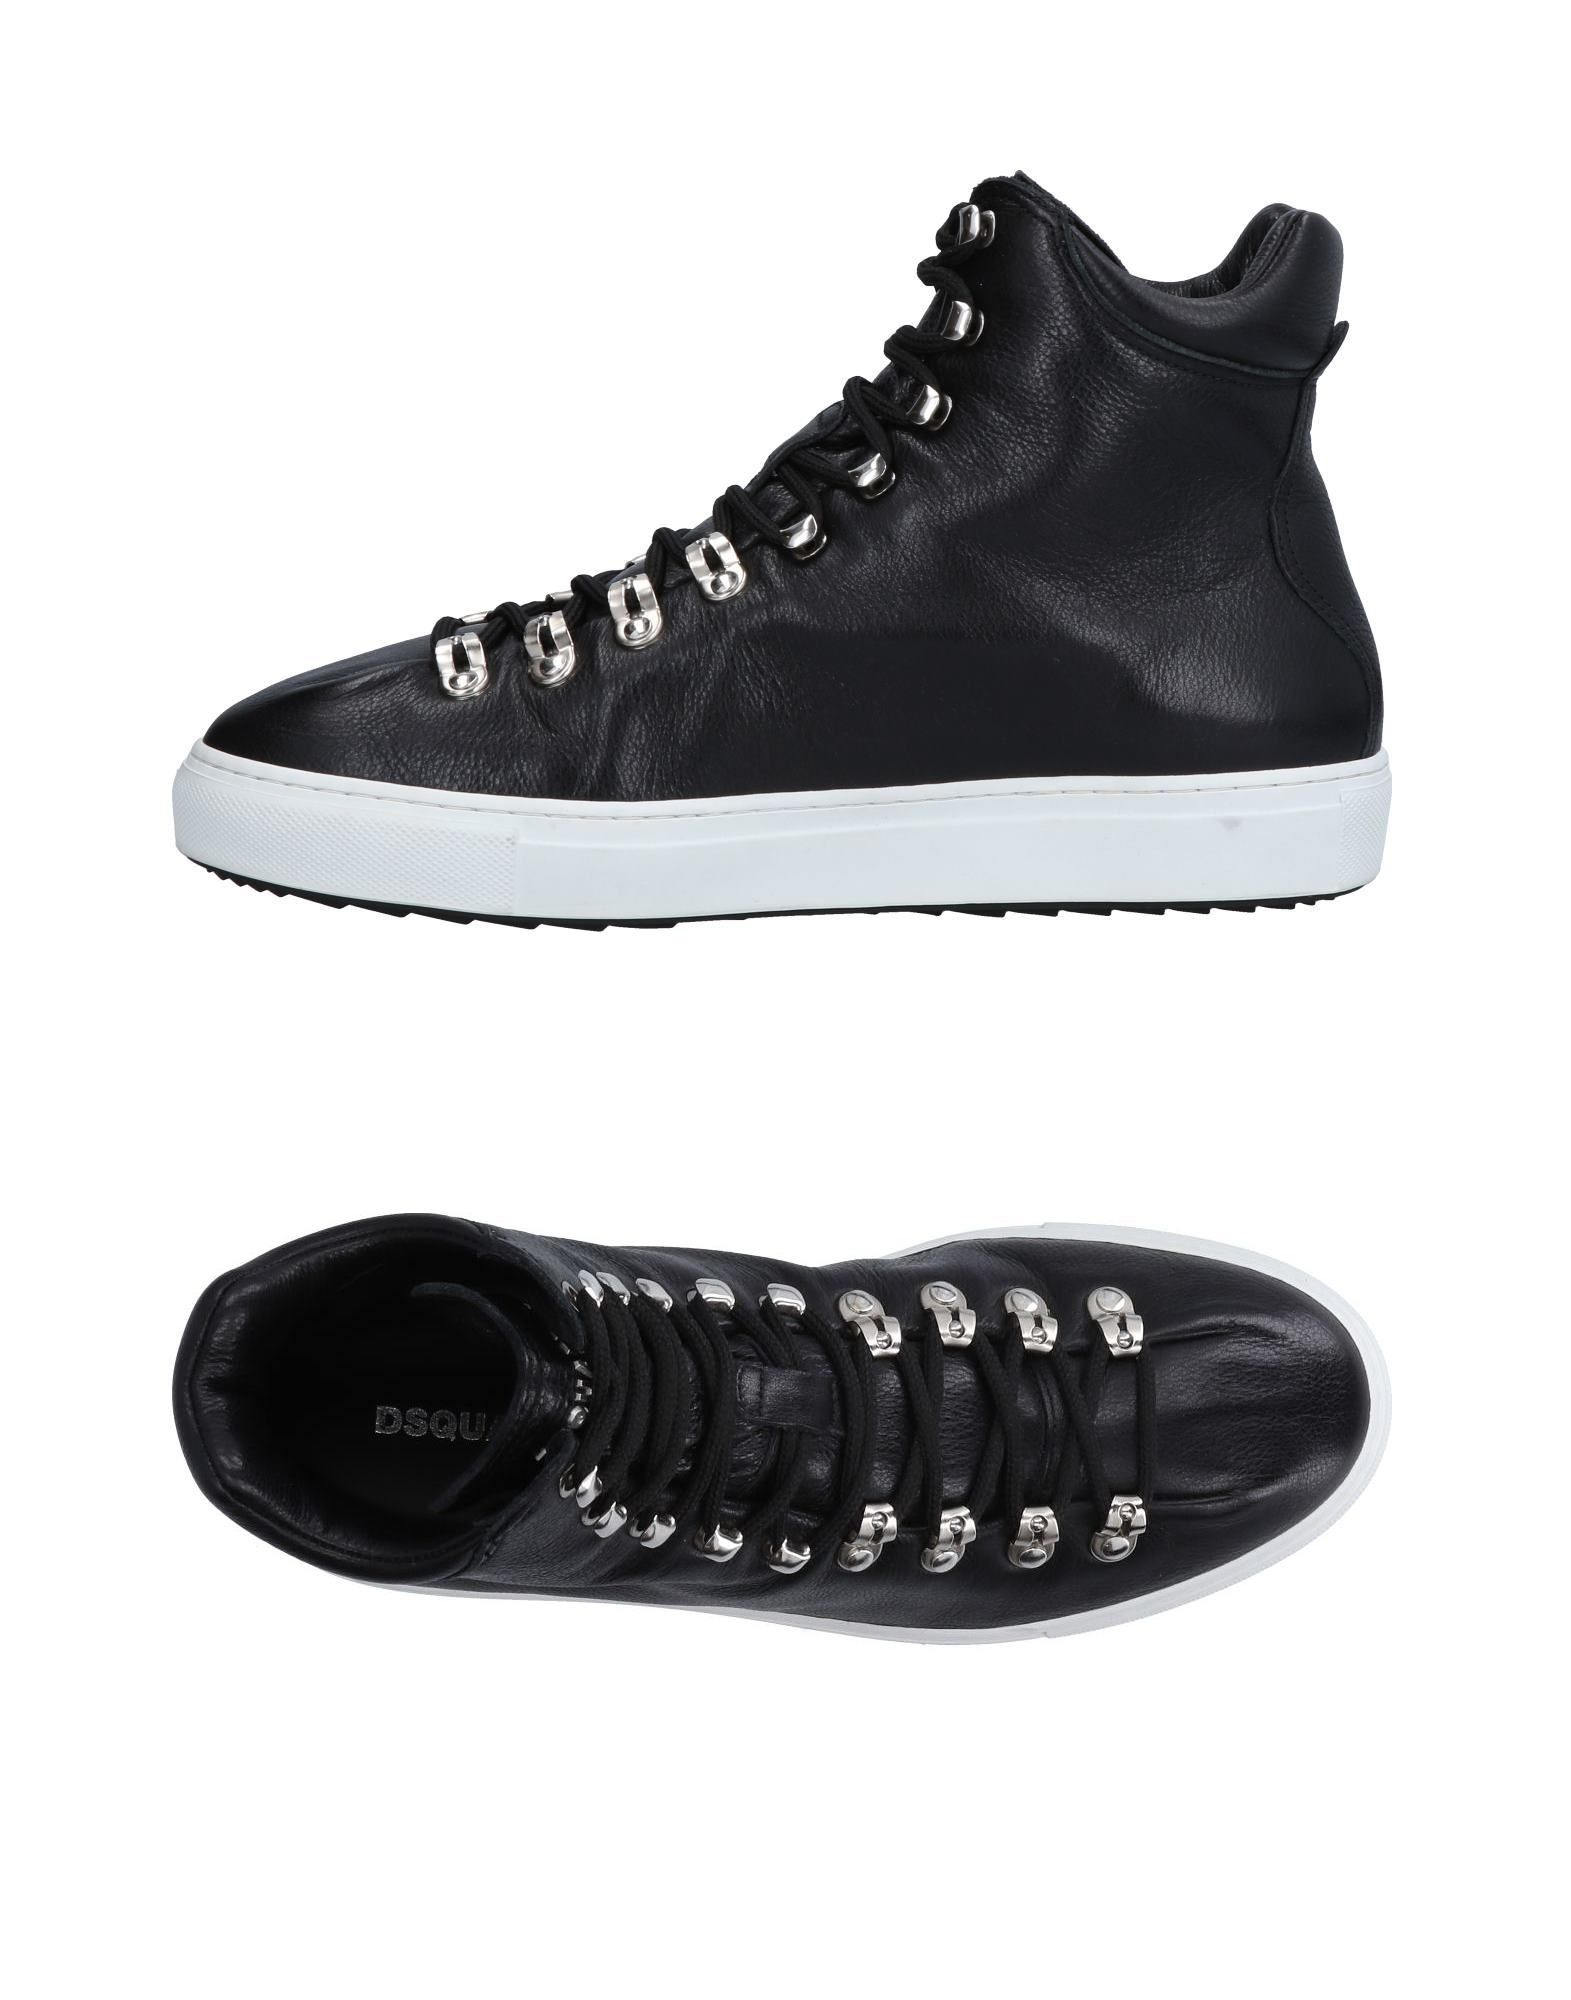 Dsquared2 Gute Sneakers Herren  11505366PQ Gute Dsquared2 Qualität beliebte Schuhe 5a9ae5